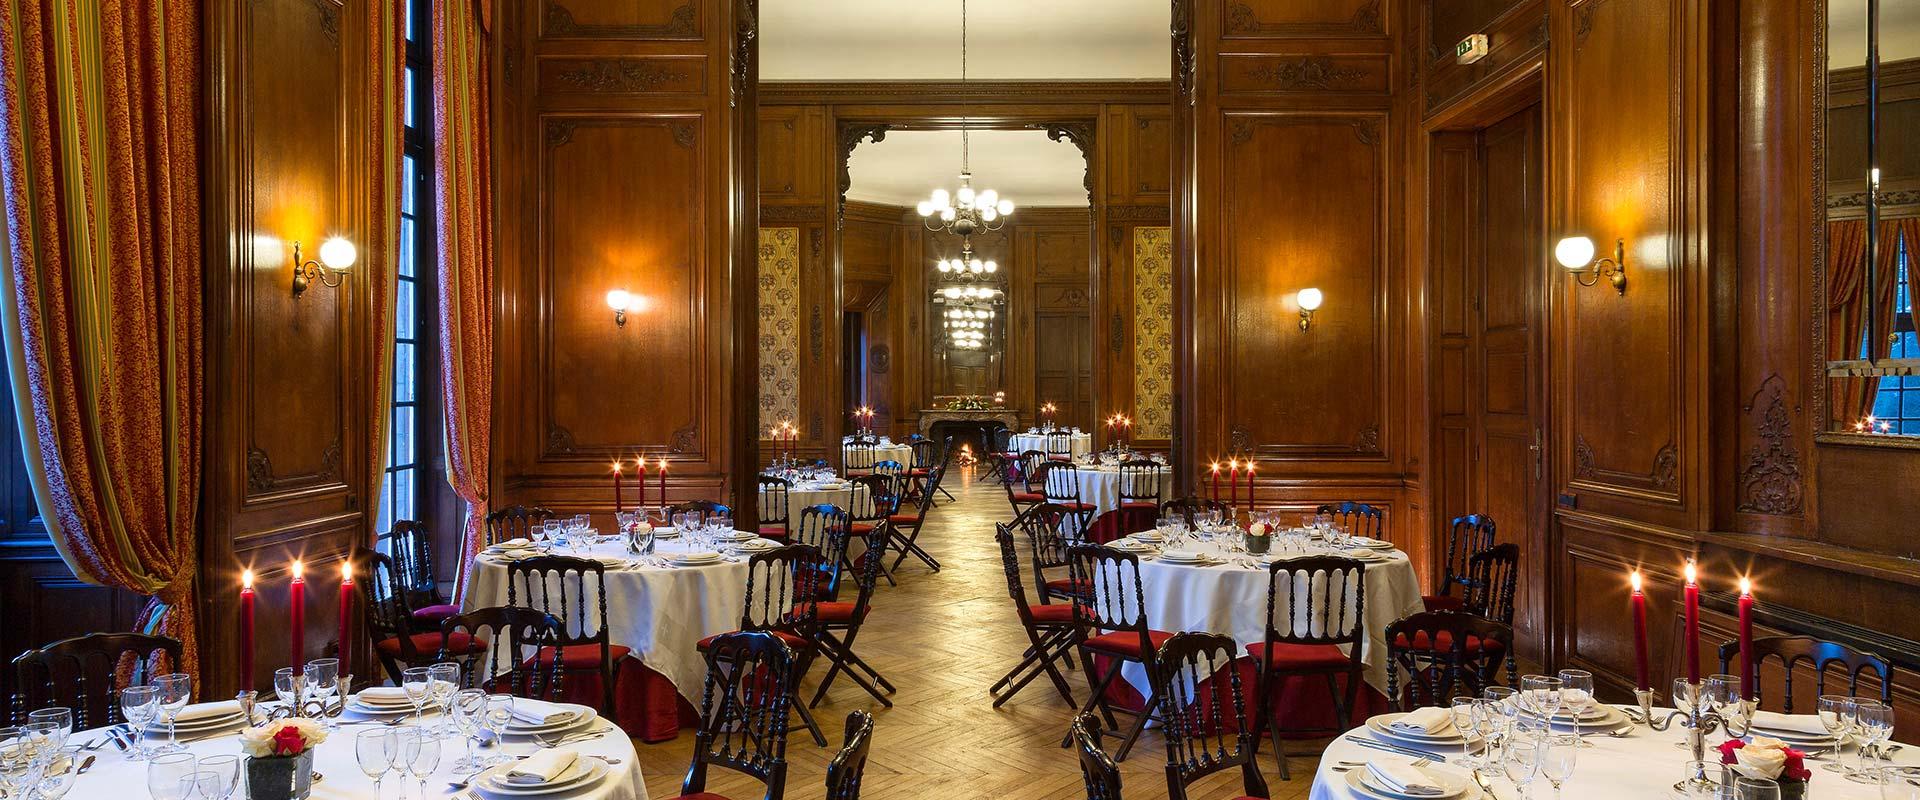 salles-restaurant